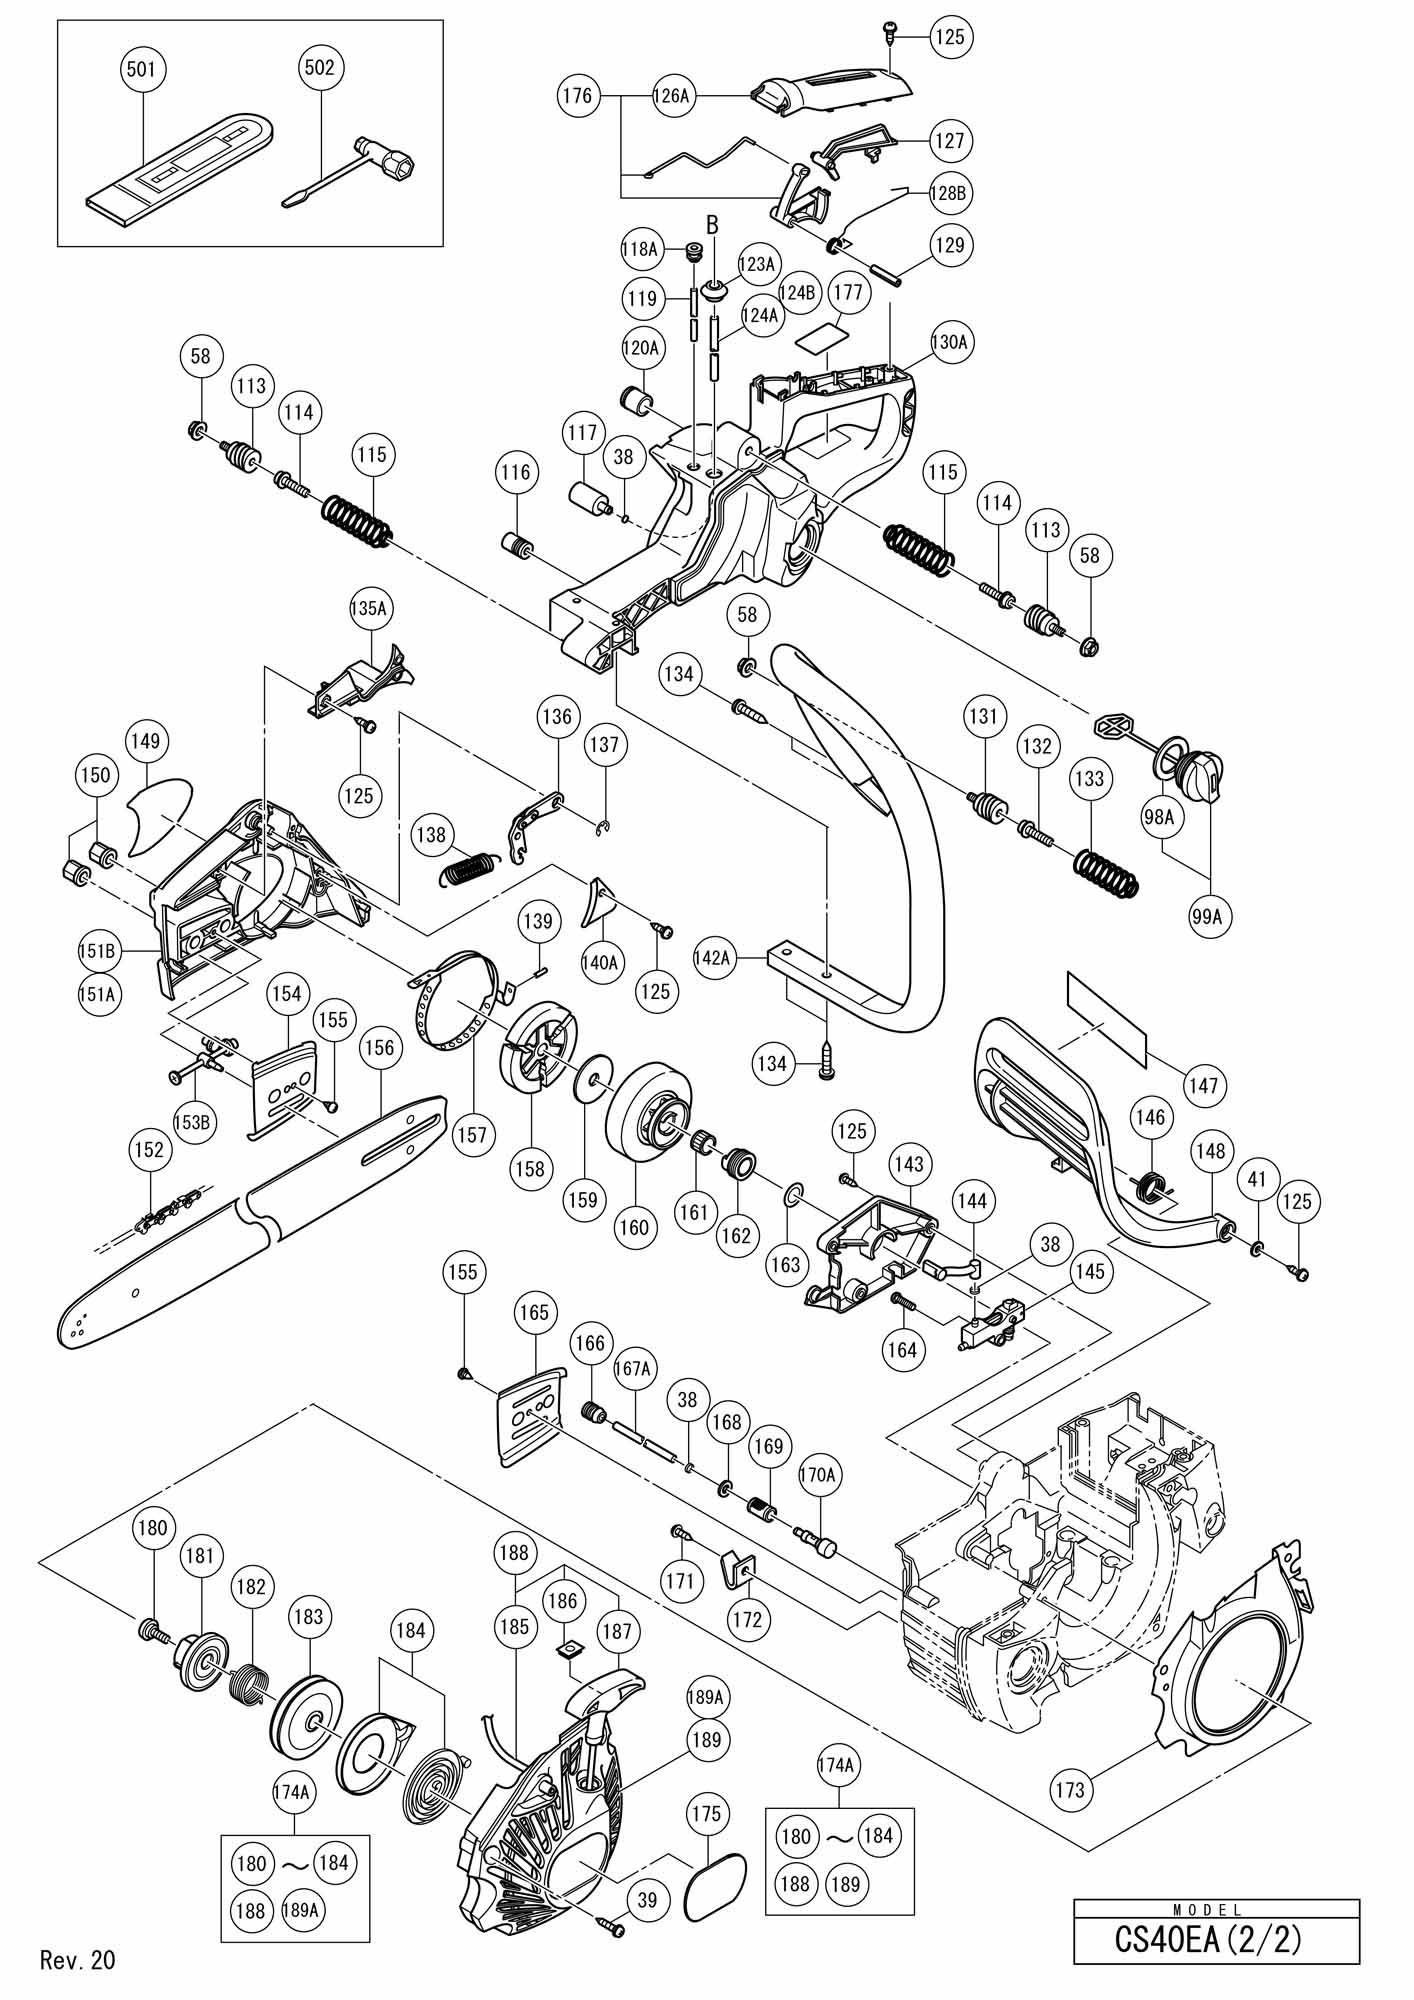 Hitachi Carb Diagram - Wiring Diagrams List